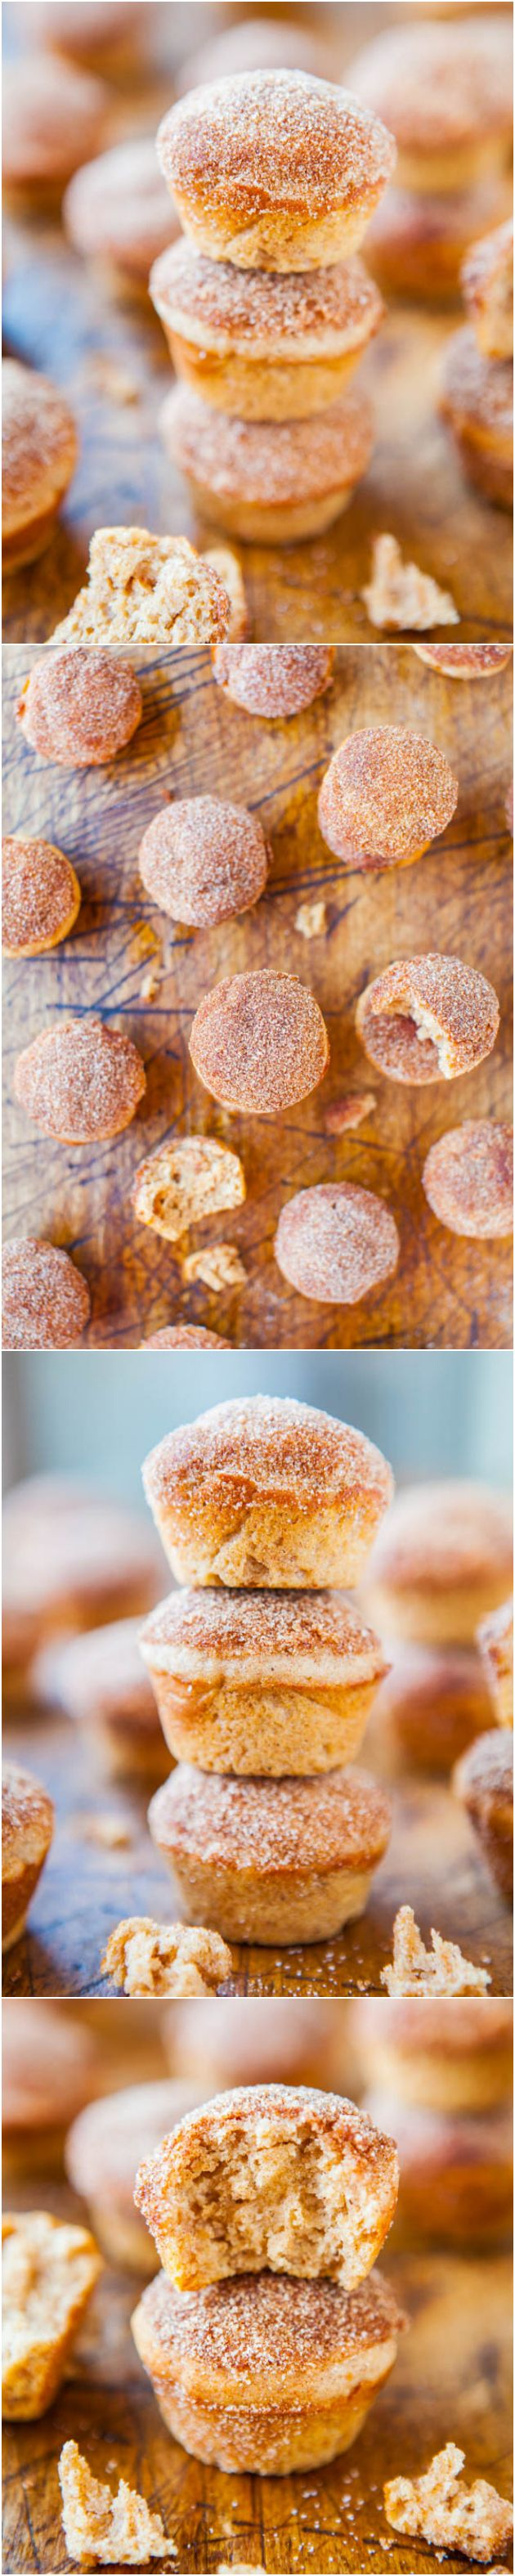 Cinnamon Sugar Mini Donut Muffins - Baked mini muffins that taste like fried mini donuts! (Love it when healthier choices taste so good!)